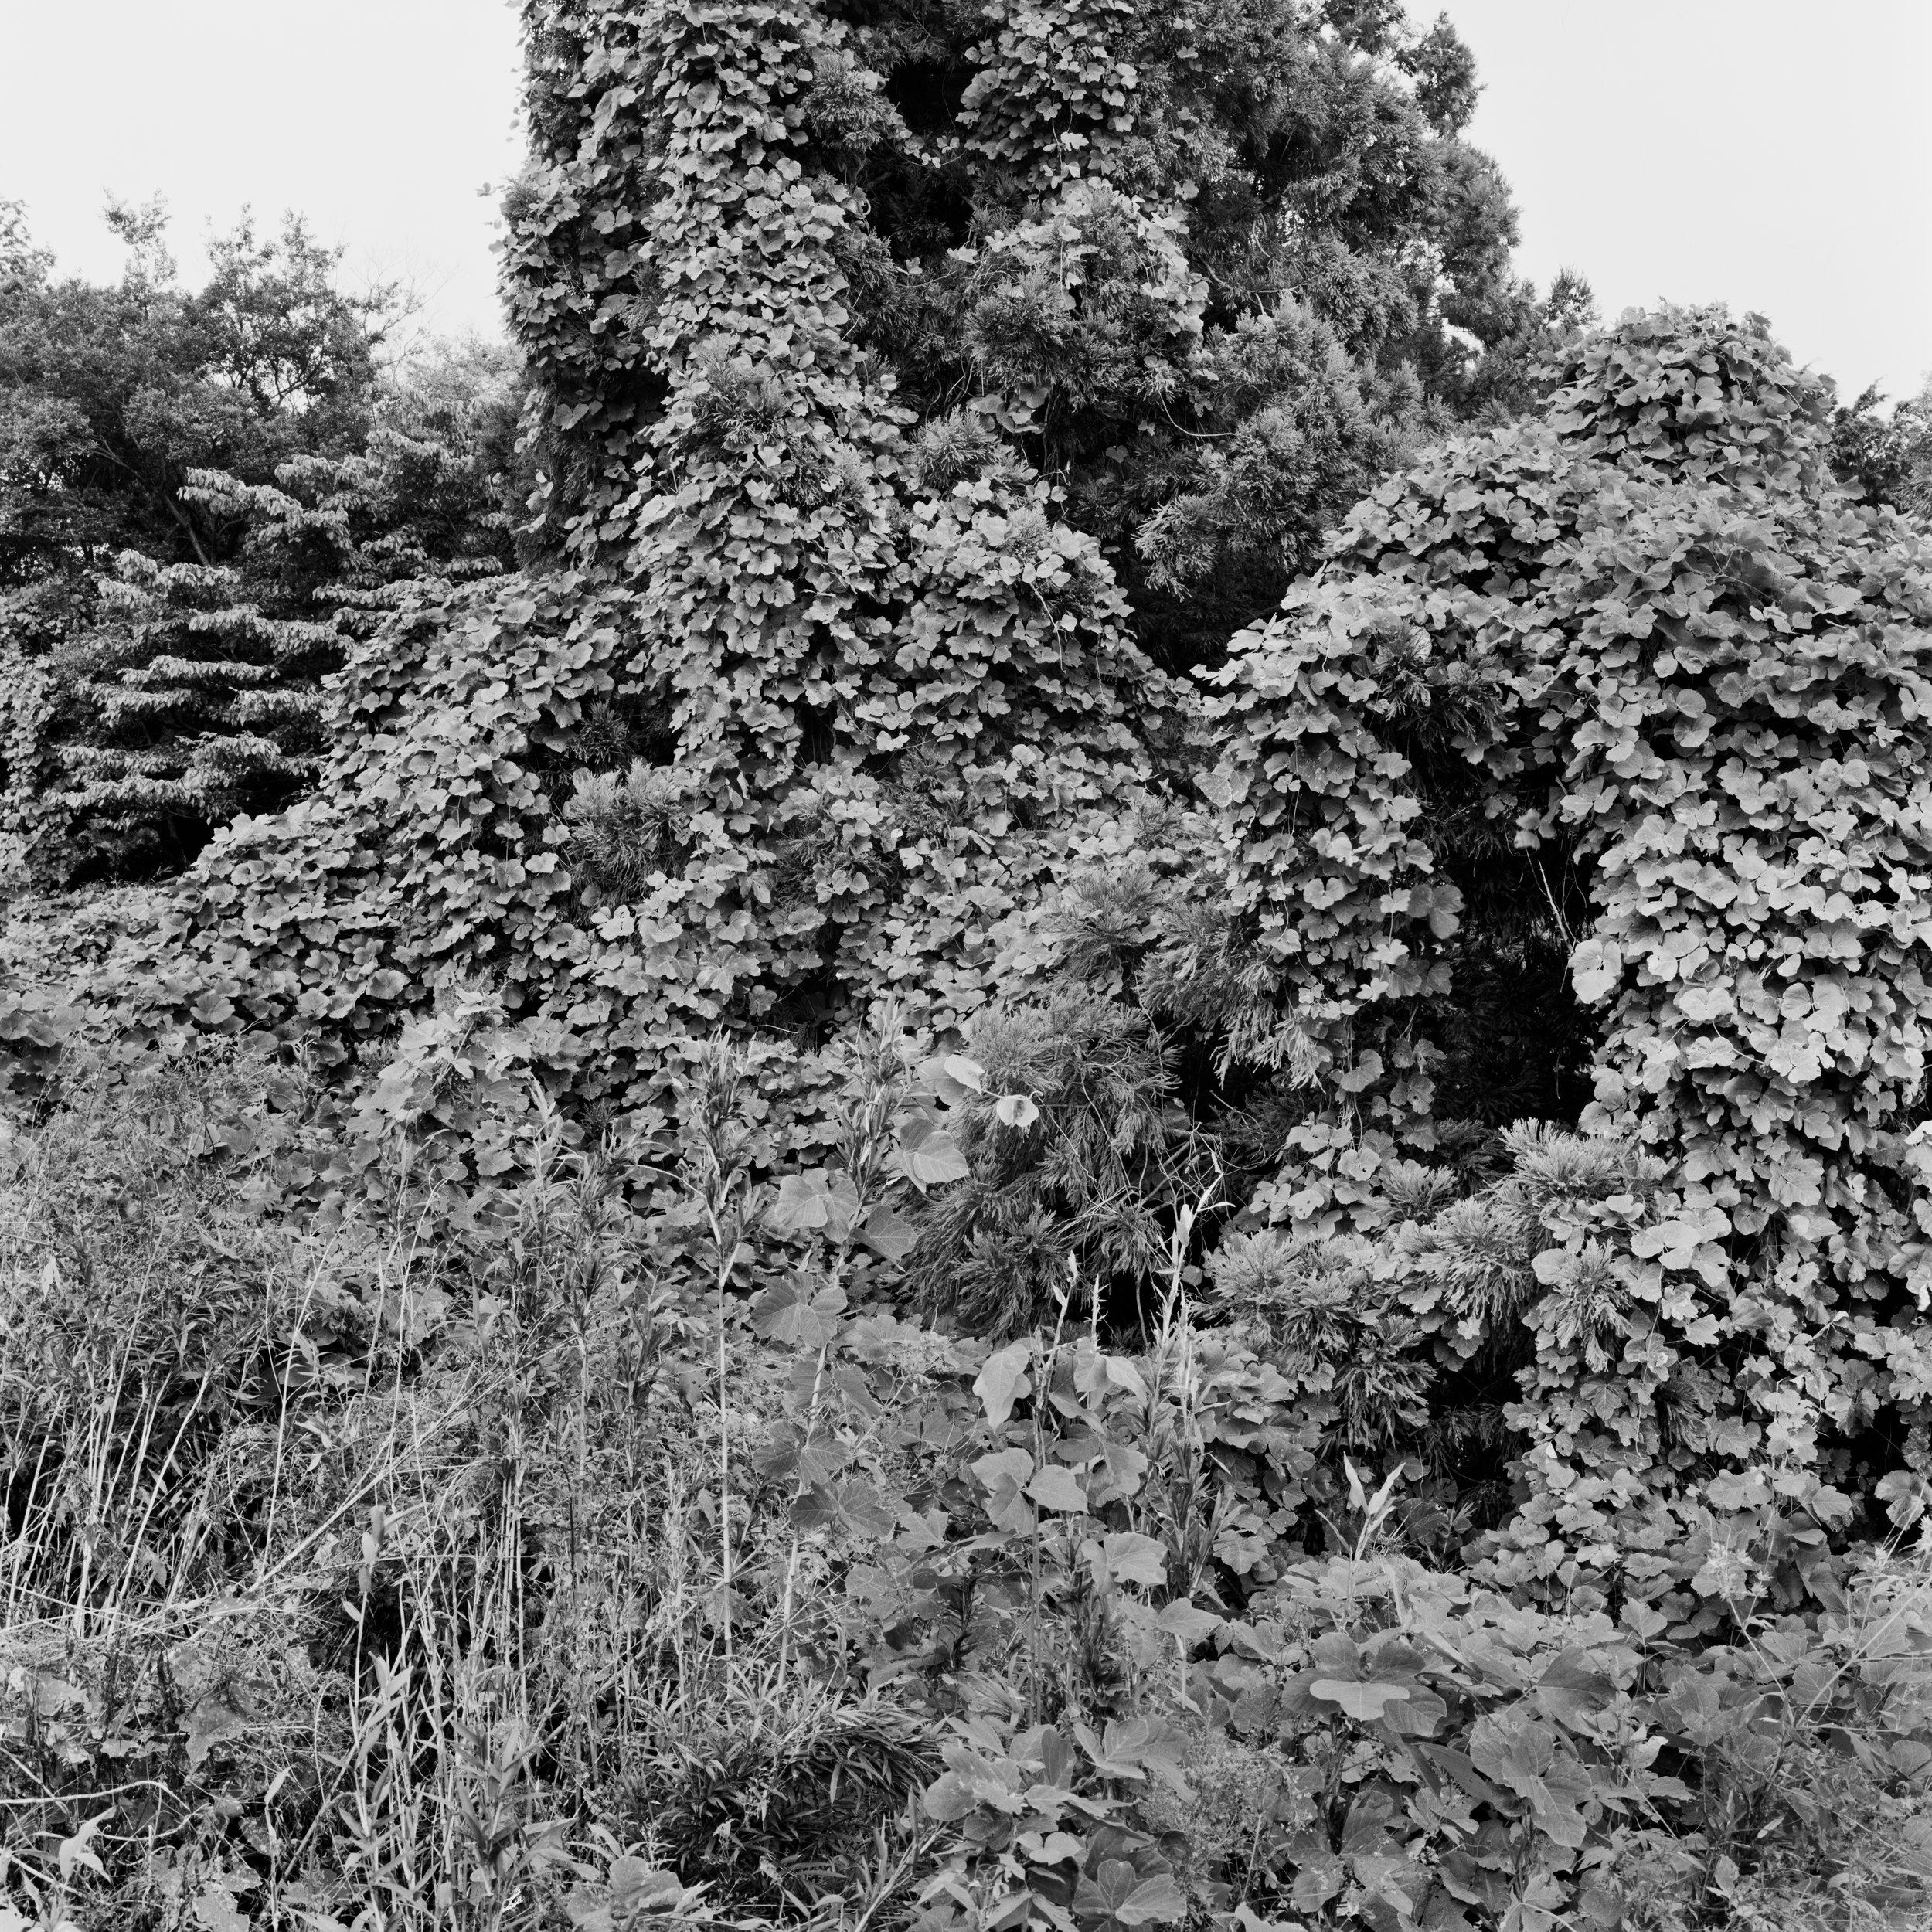 woodland45_026fix.jpg